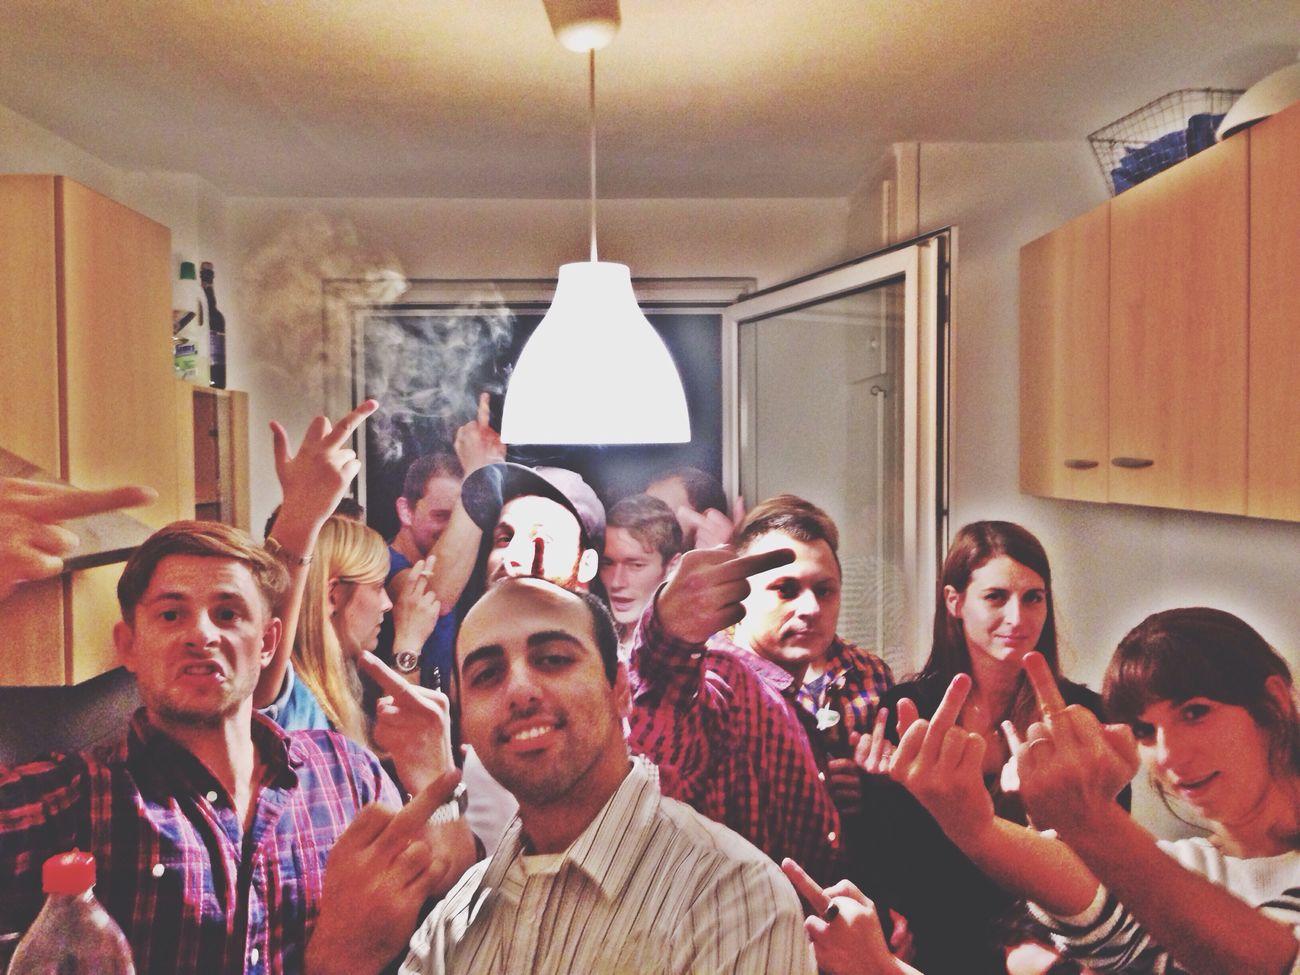 Fuckthepolice Kitchenparty Everbodygivesafuck Friends